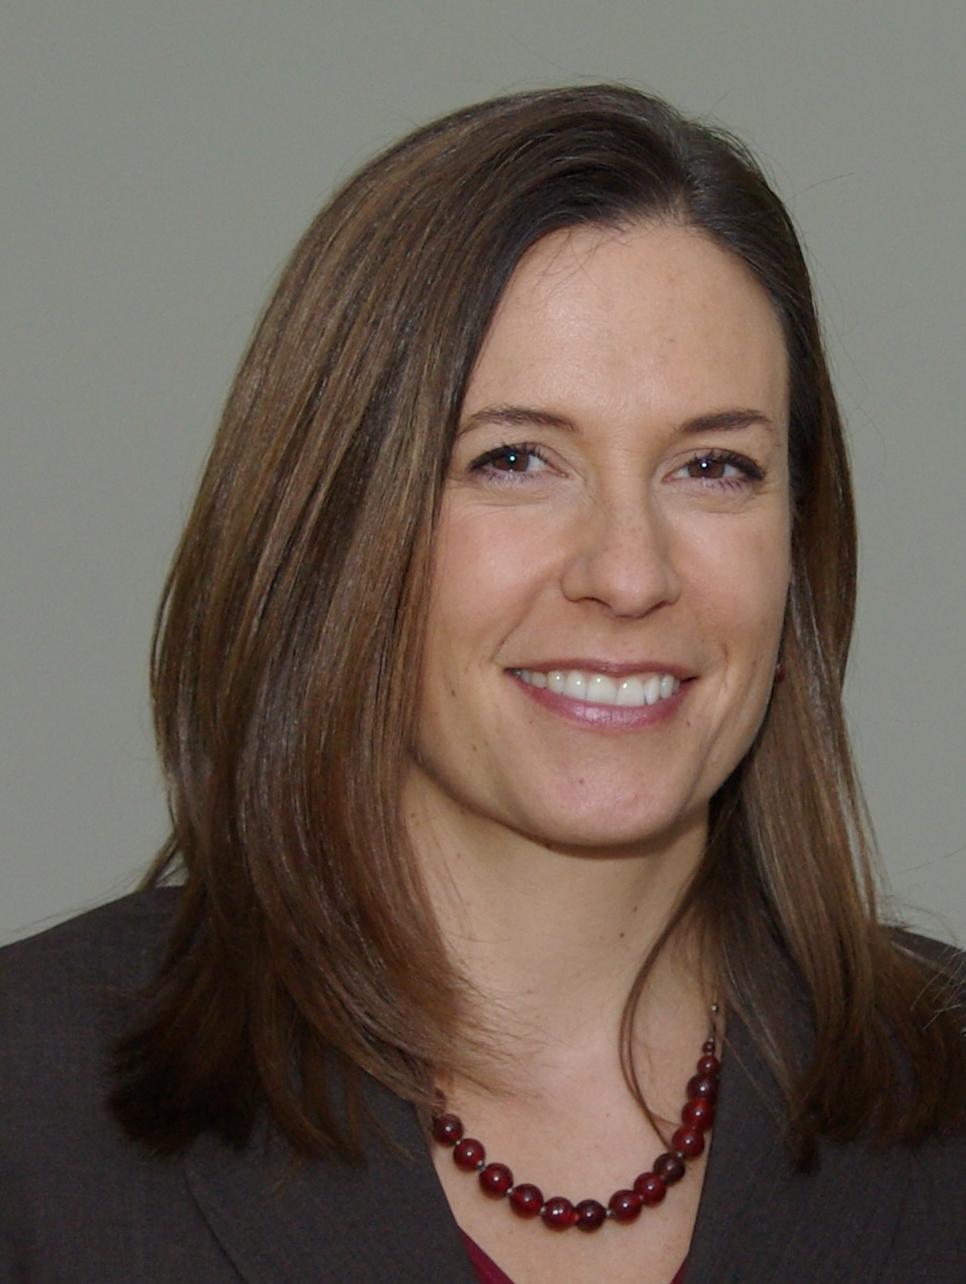 Dr. Theresa Betancourt